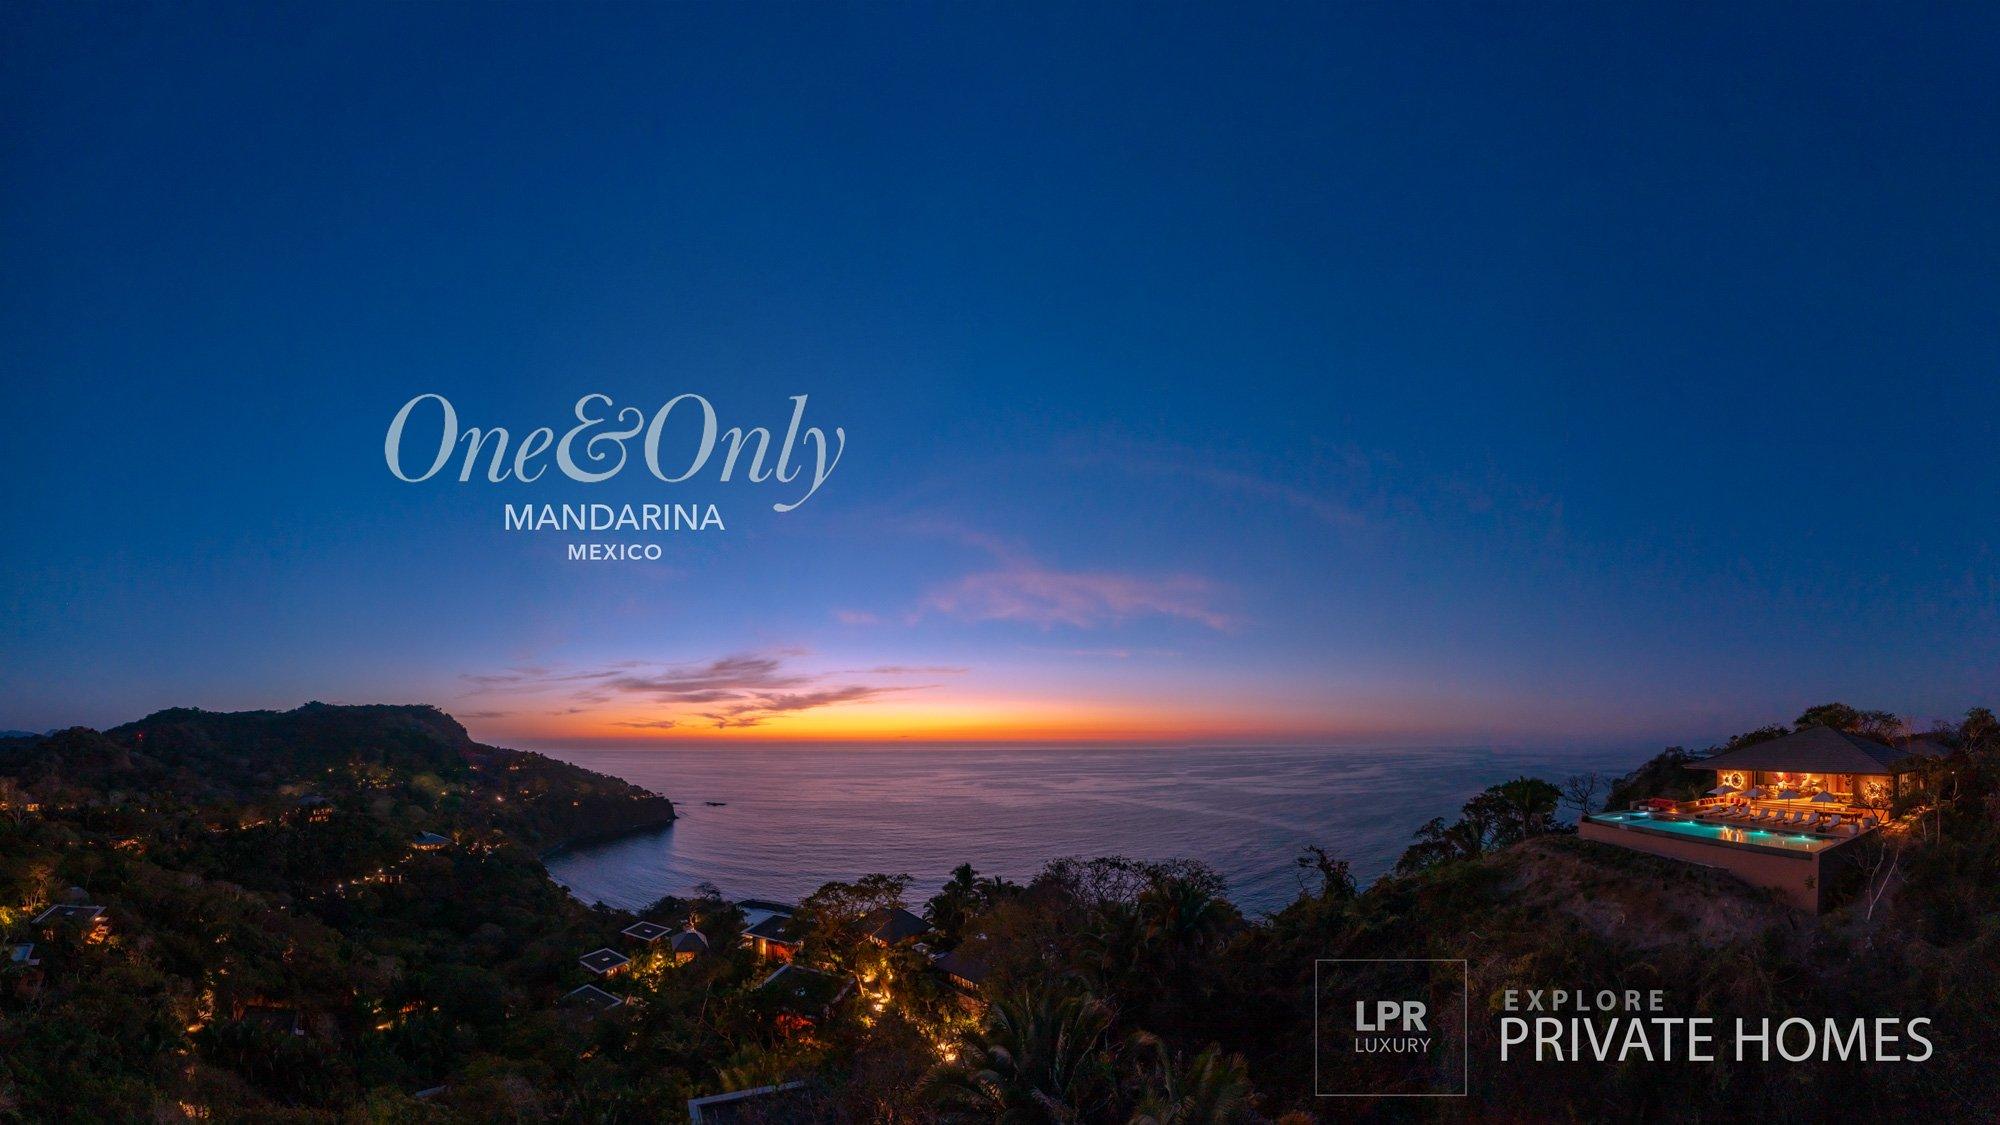 The Private Homes at One&Only Mandarina, Riviera Nayarit, Mexico